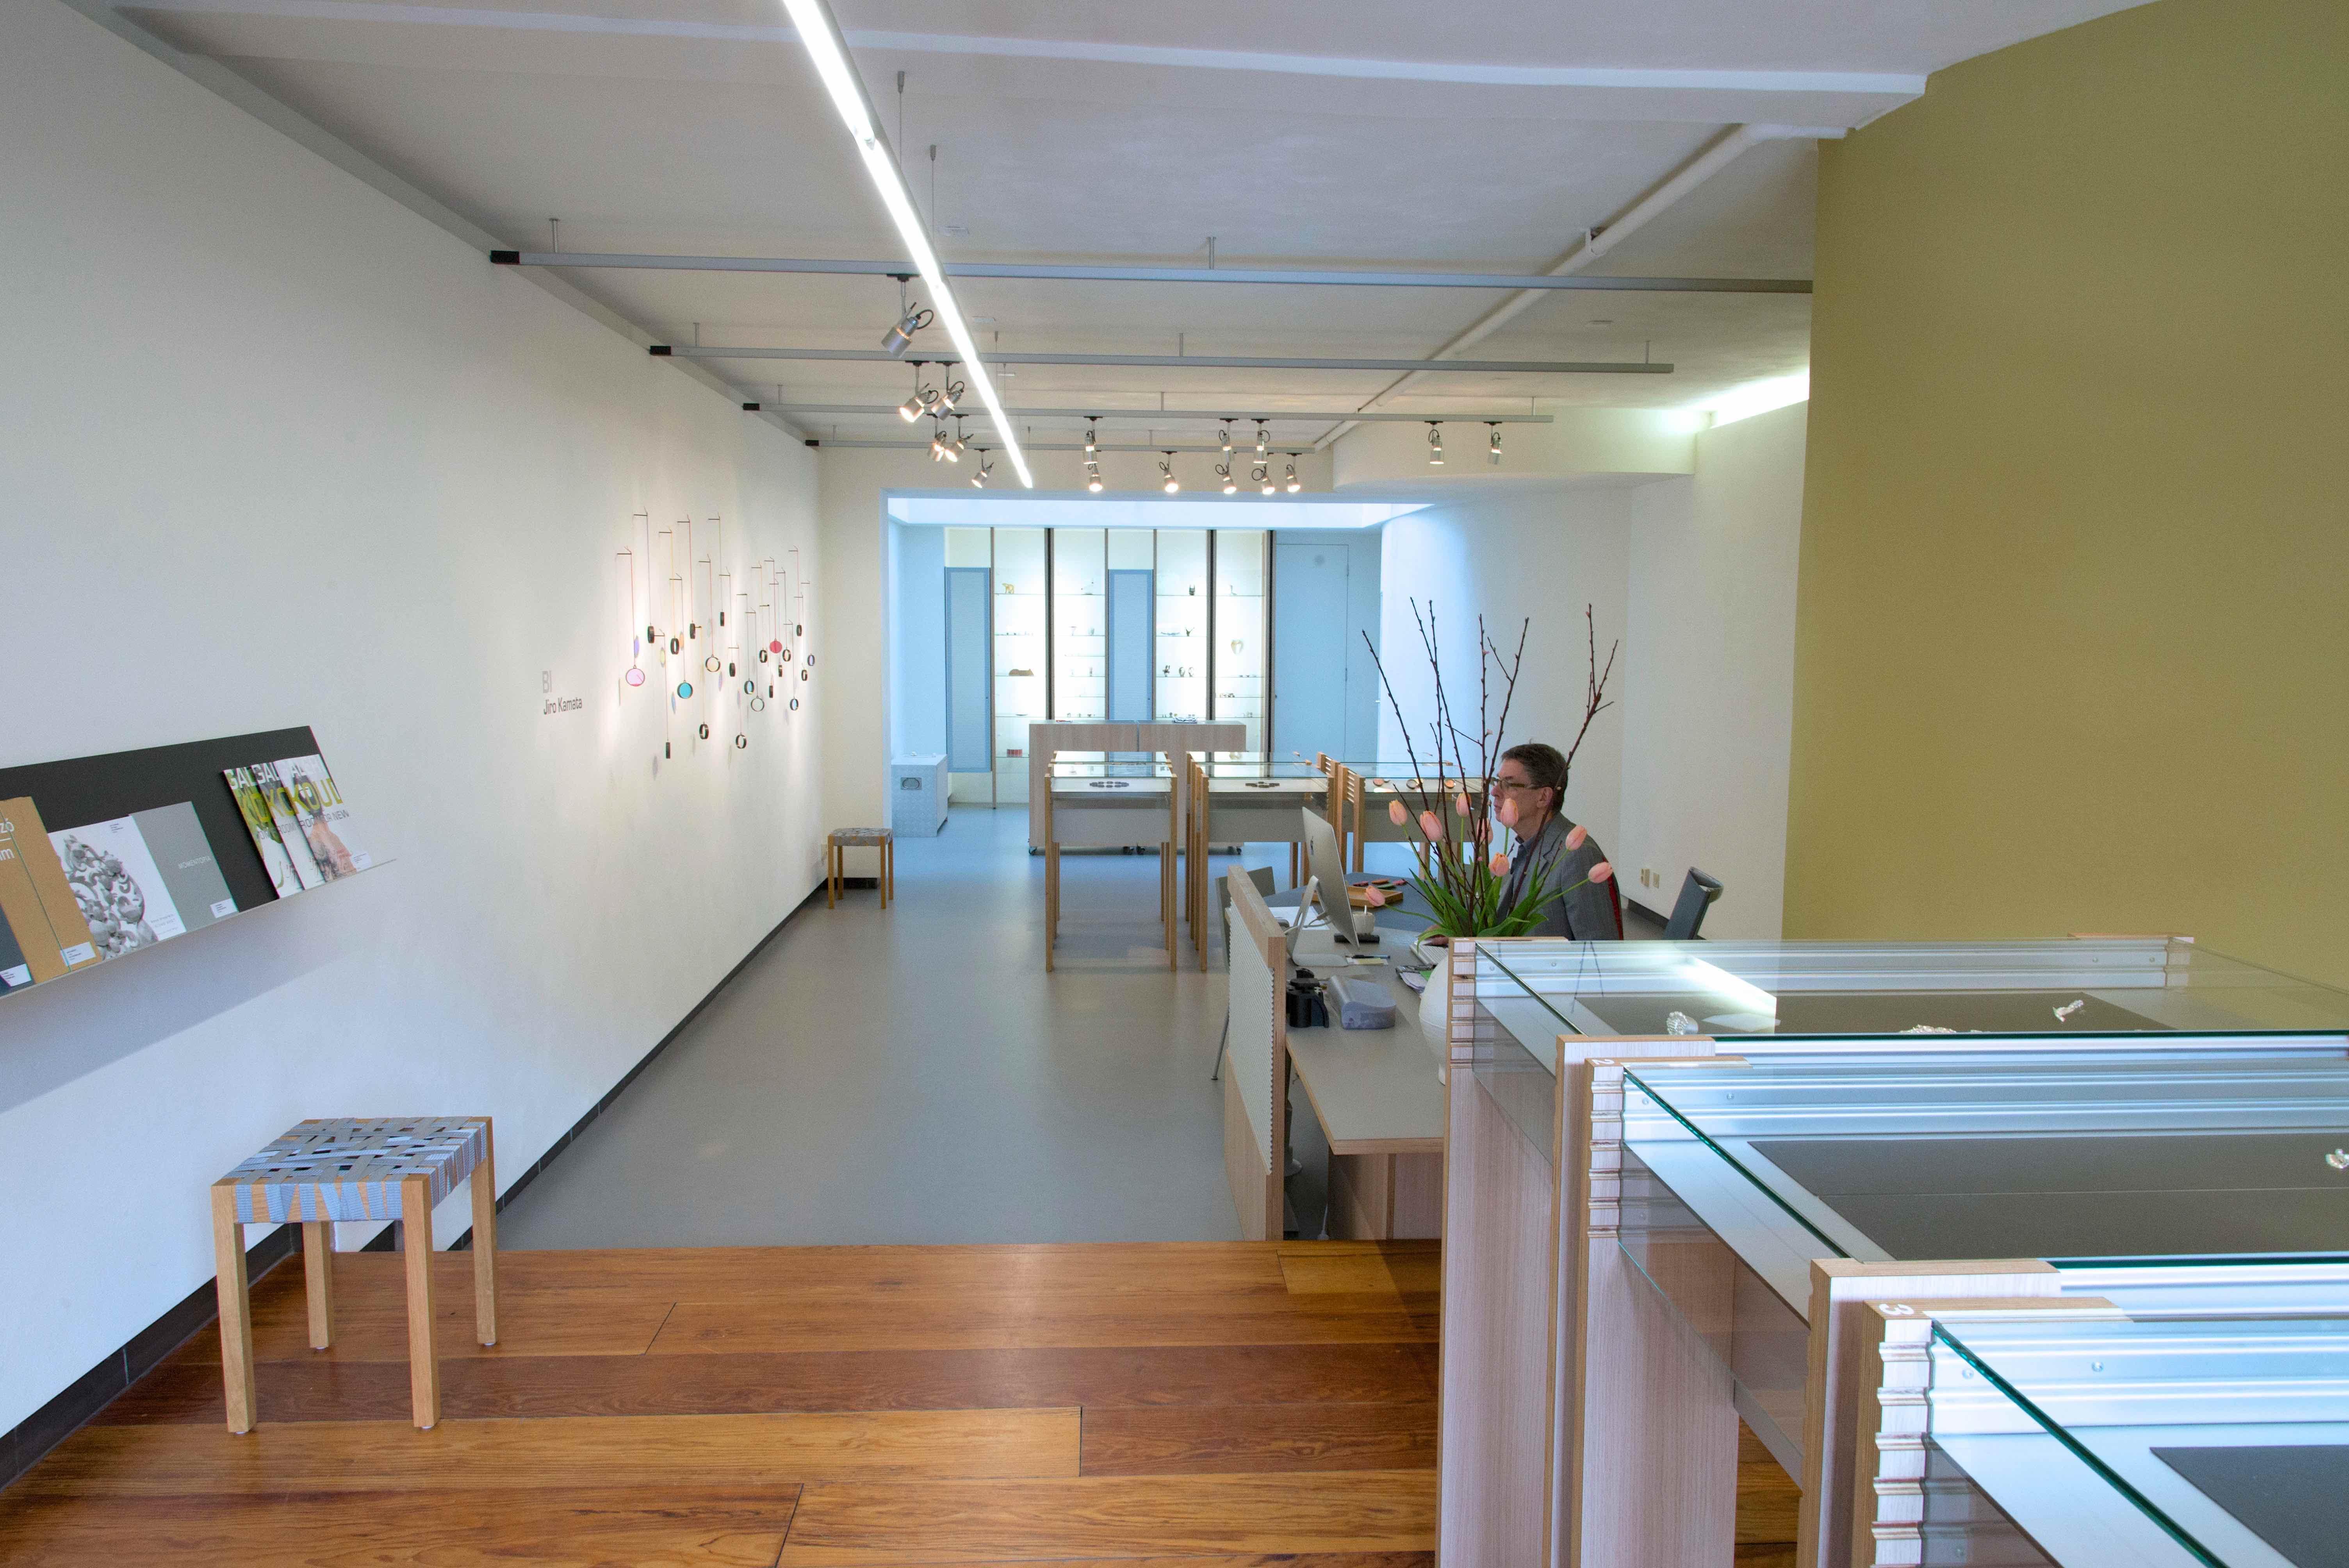 Galerie Rob Koudijs, interieur, 2014